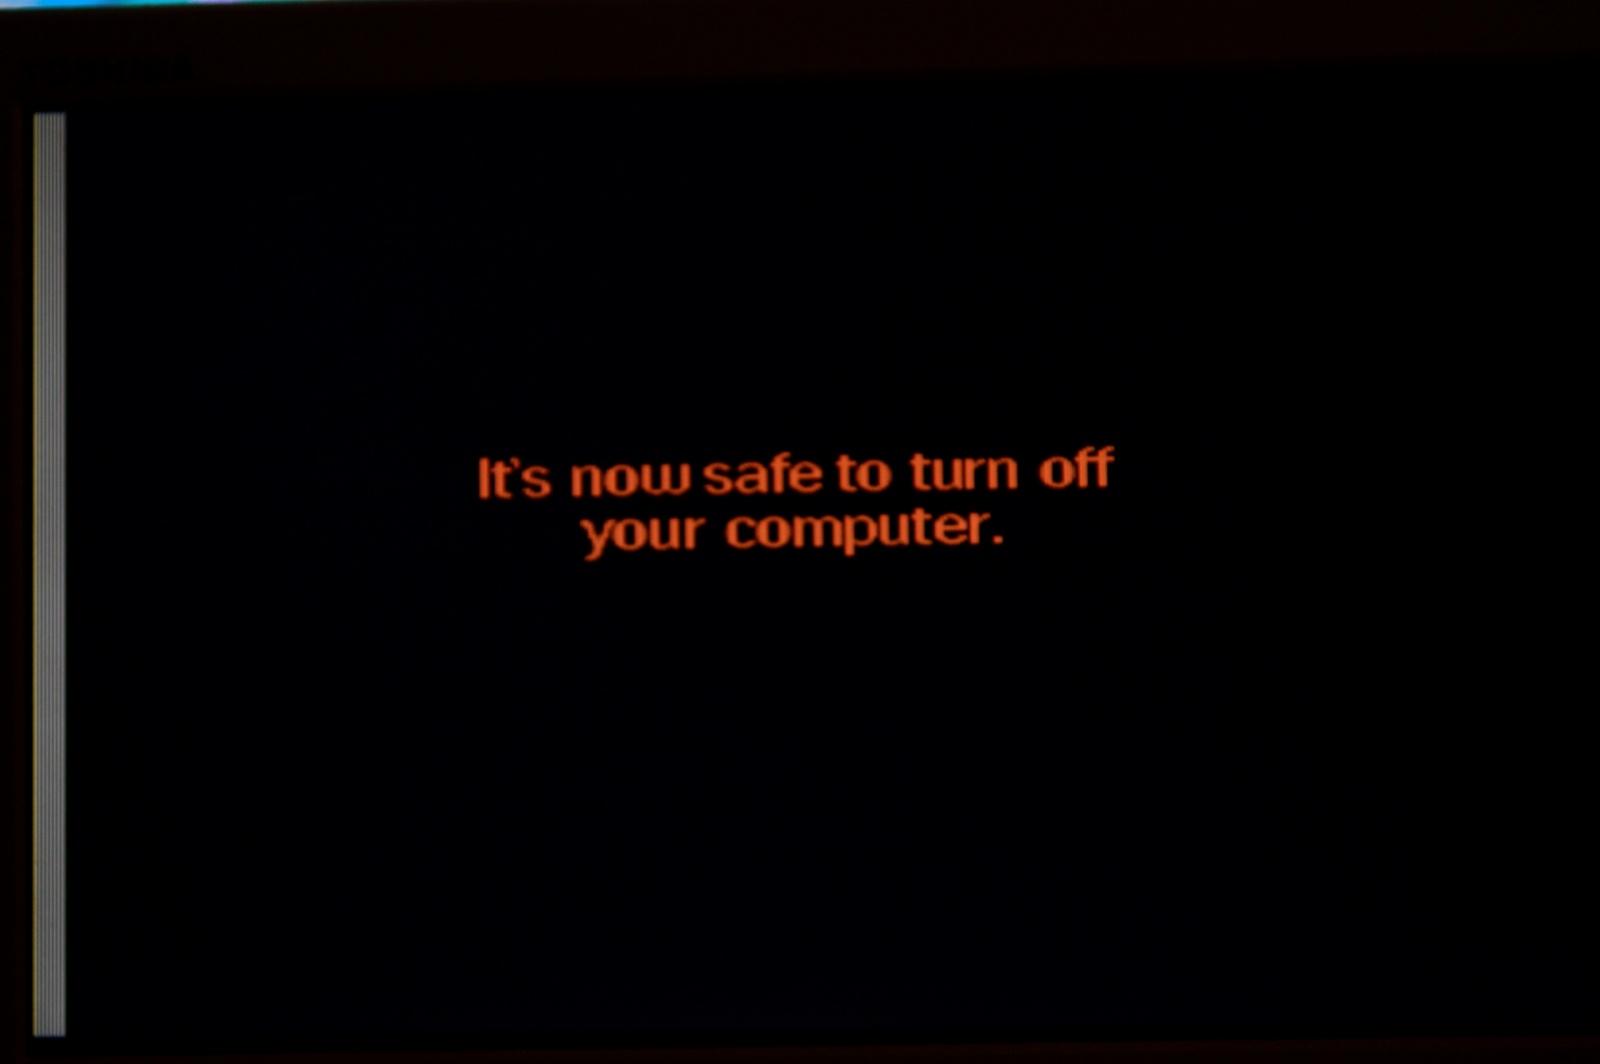 Какими были ноутбуки 20 лет назад на примере Toshiba libretto 100ct - 18